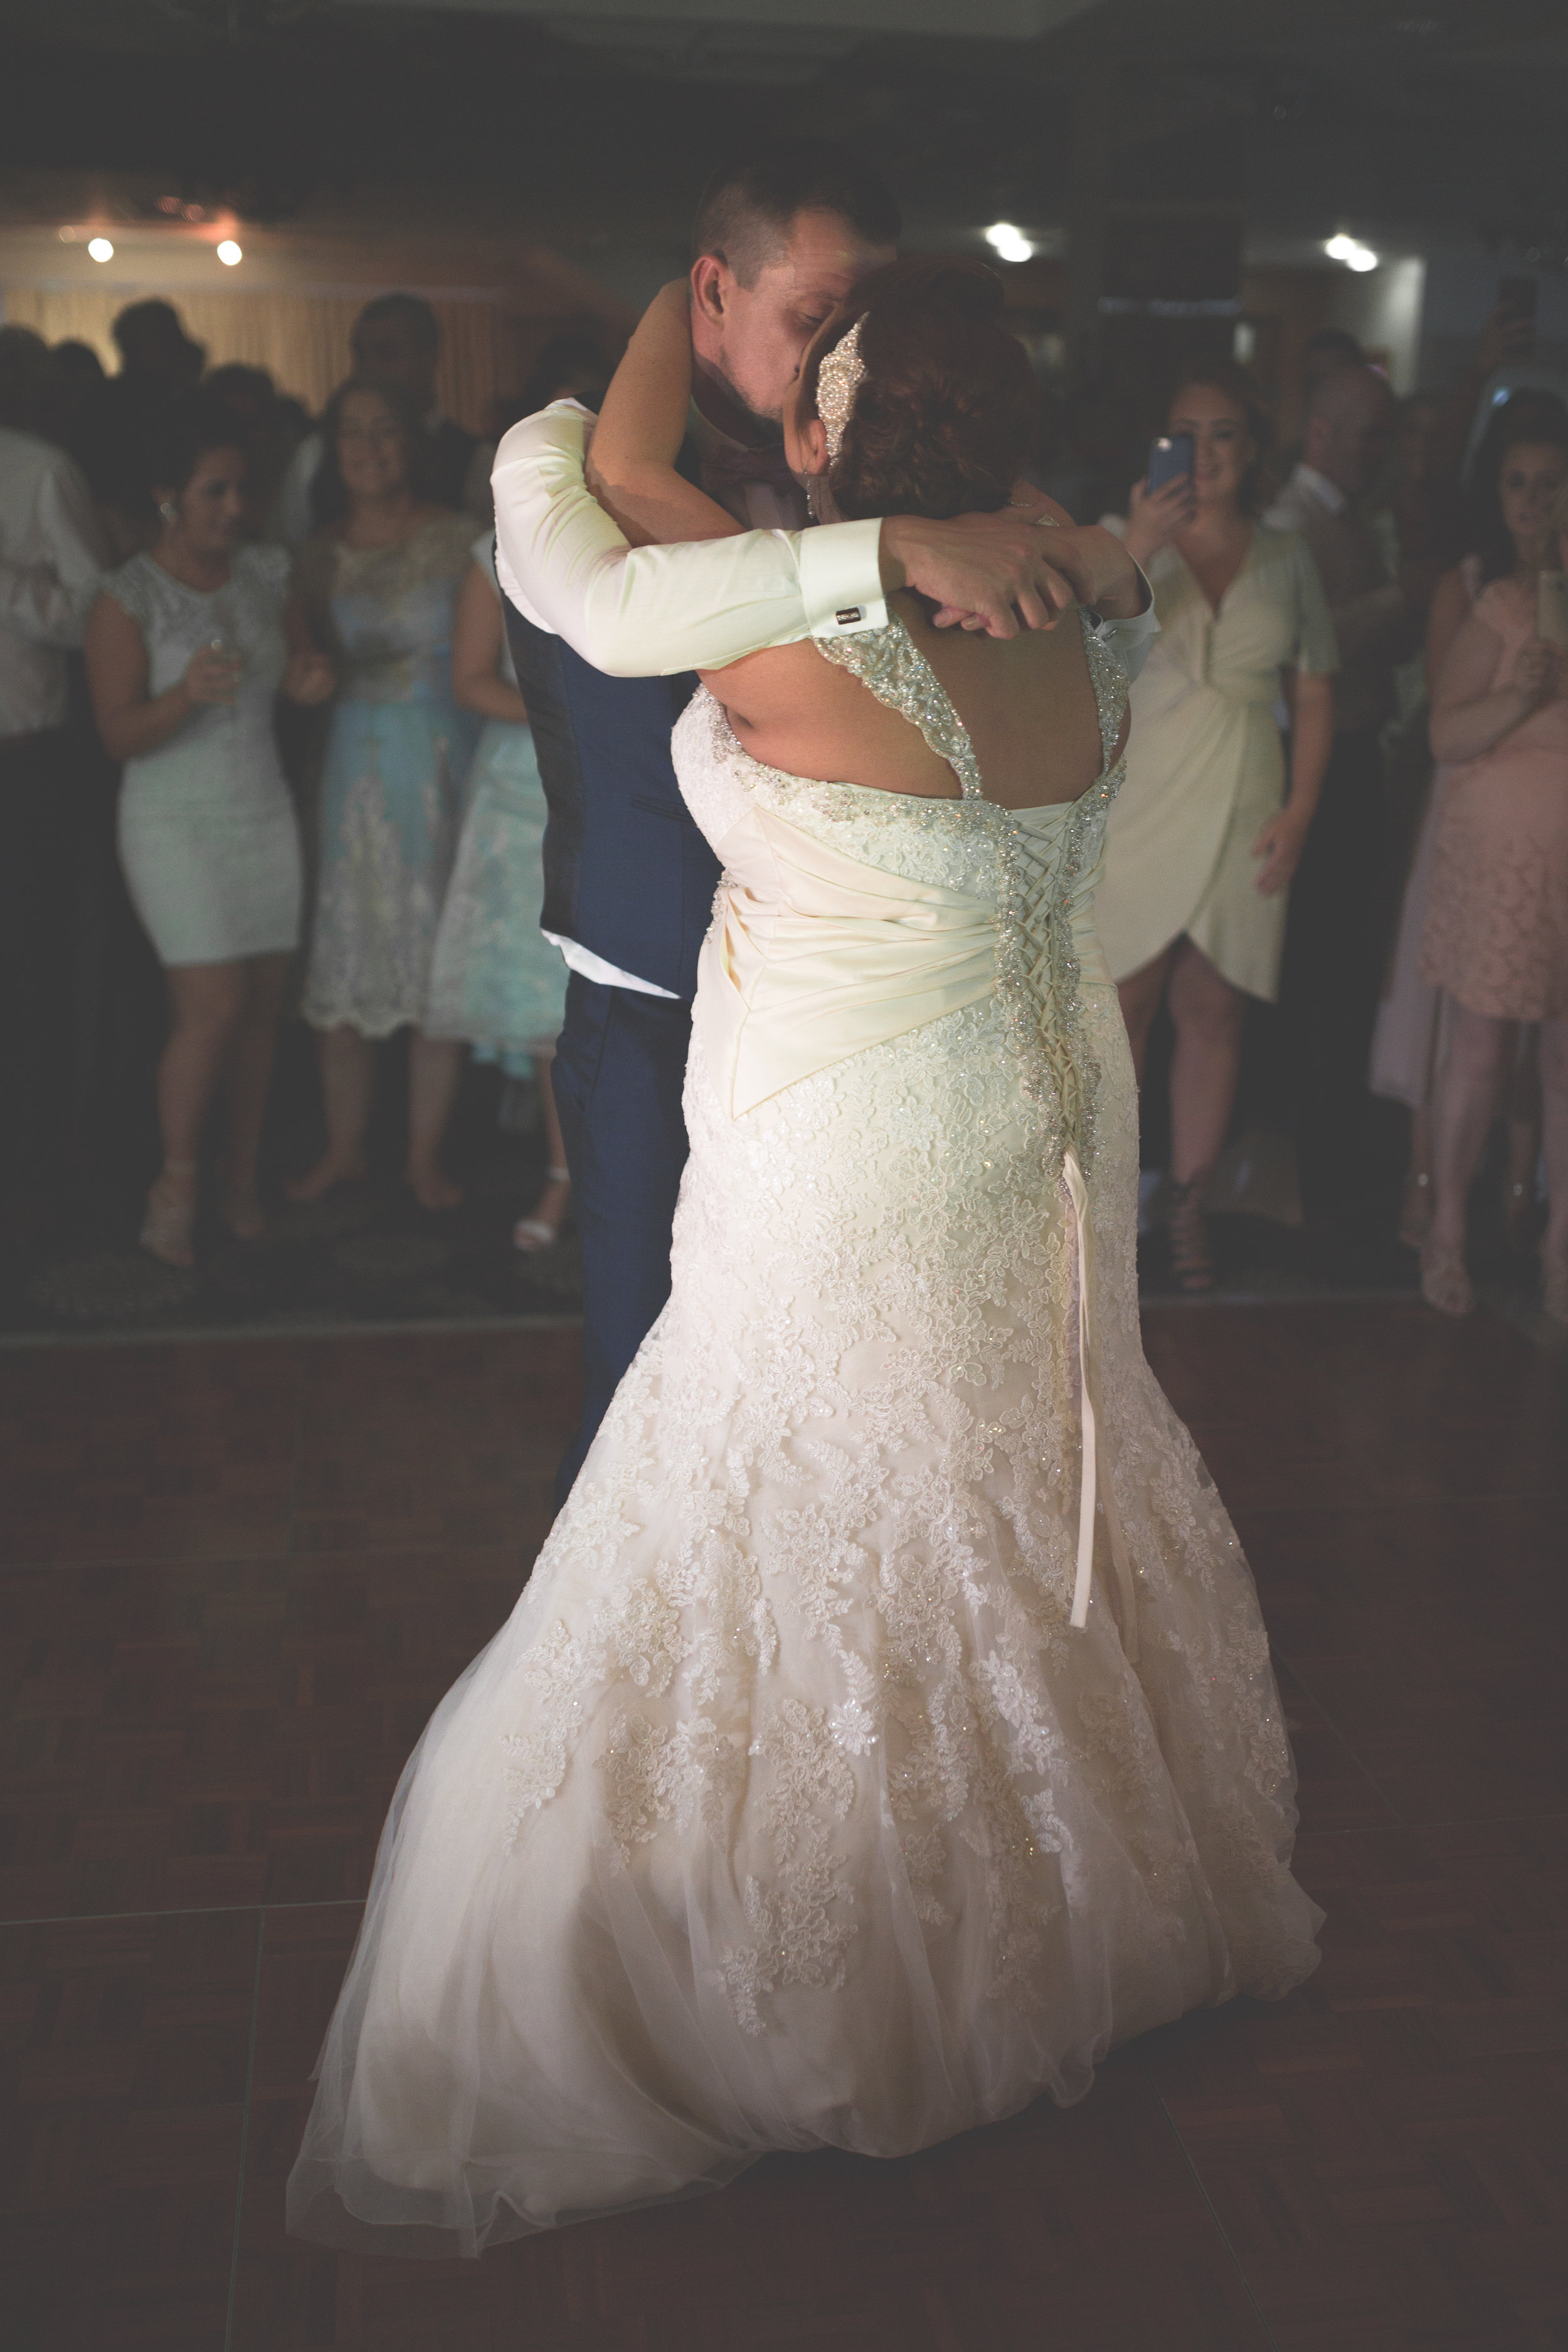 Antoinette & Stephen - First Dance | Brian McEwan Photography | Wedding Photographer Northern Ireland 16.jpg